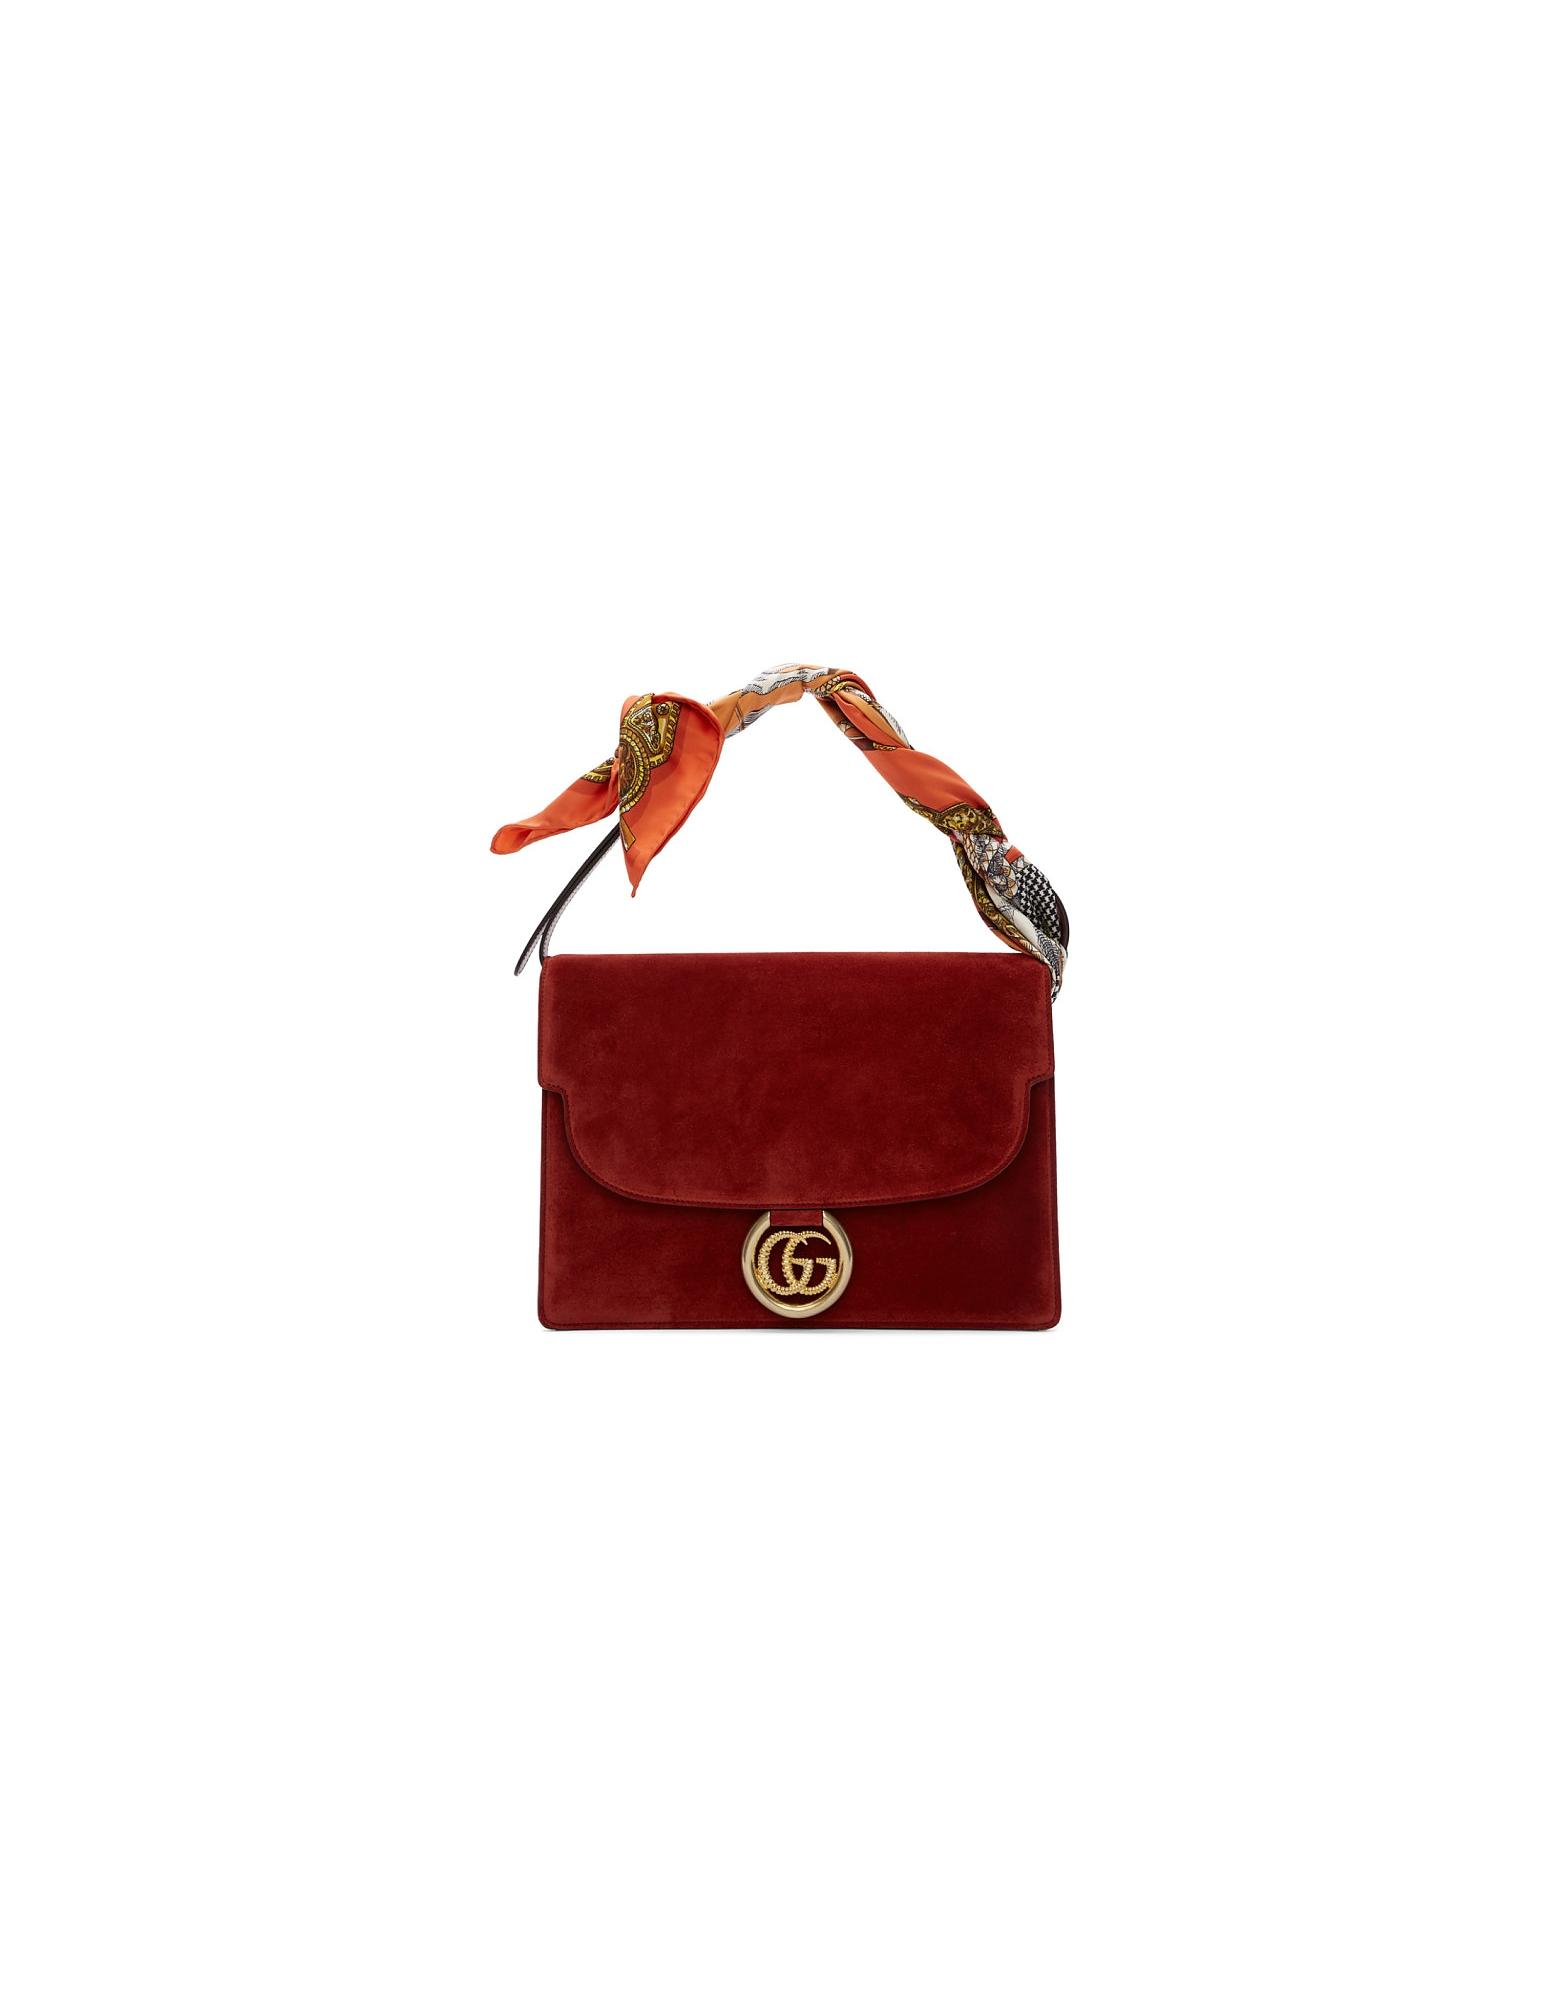 Gucci Designer Handbags, Red Suede Medium GG Ring Scarf Shoulder Bag